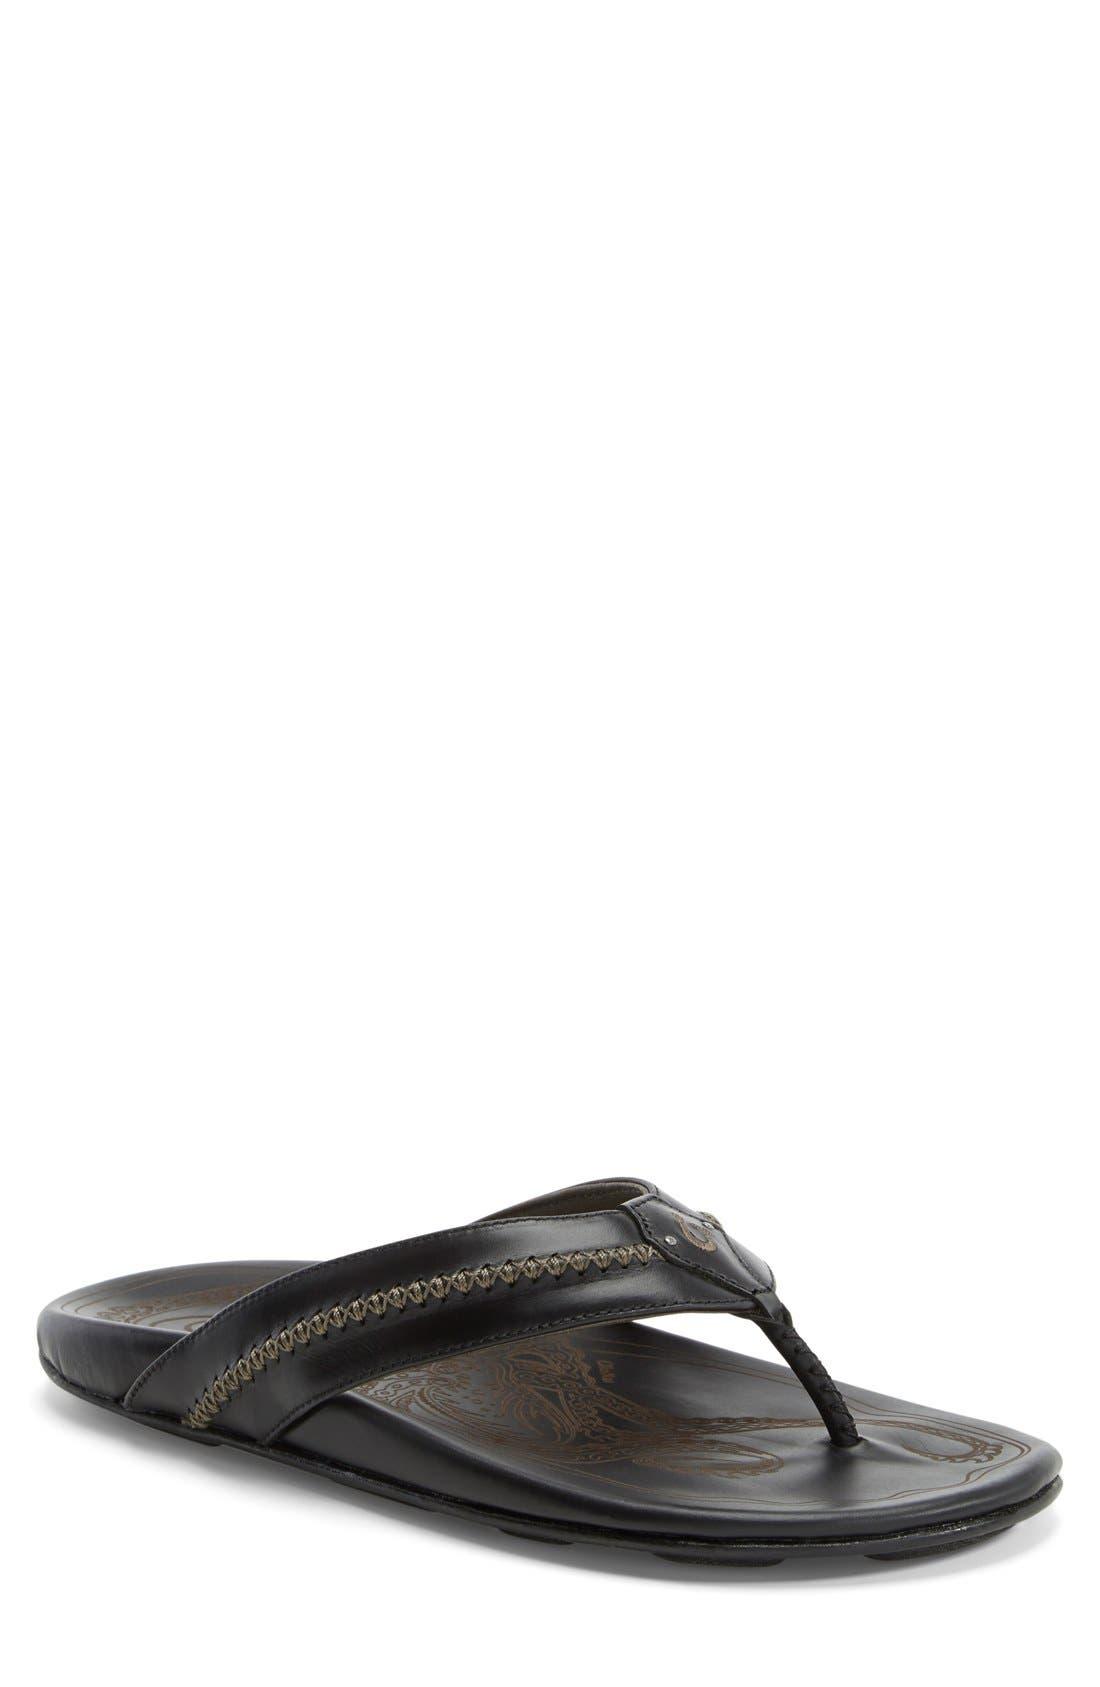 OluKai 'Mea Ola' Flip Flop (Men) (Regular Retail Price: $120.00)